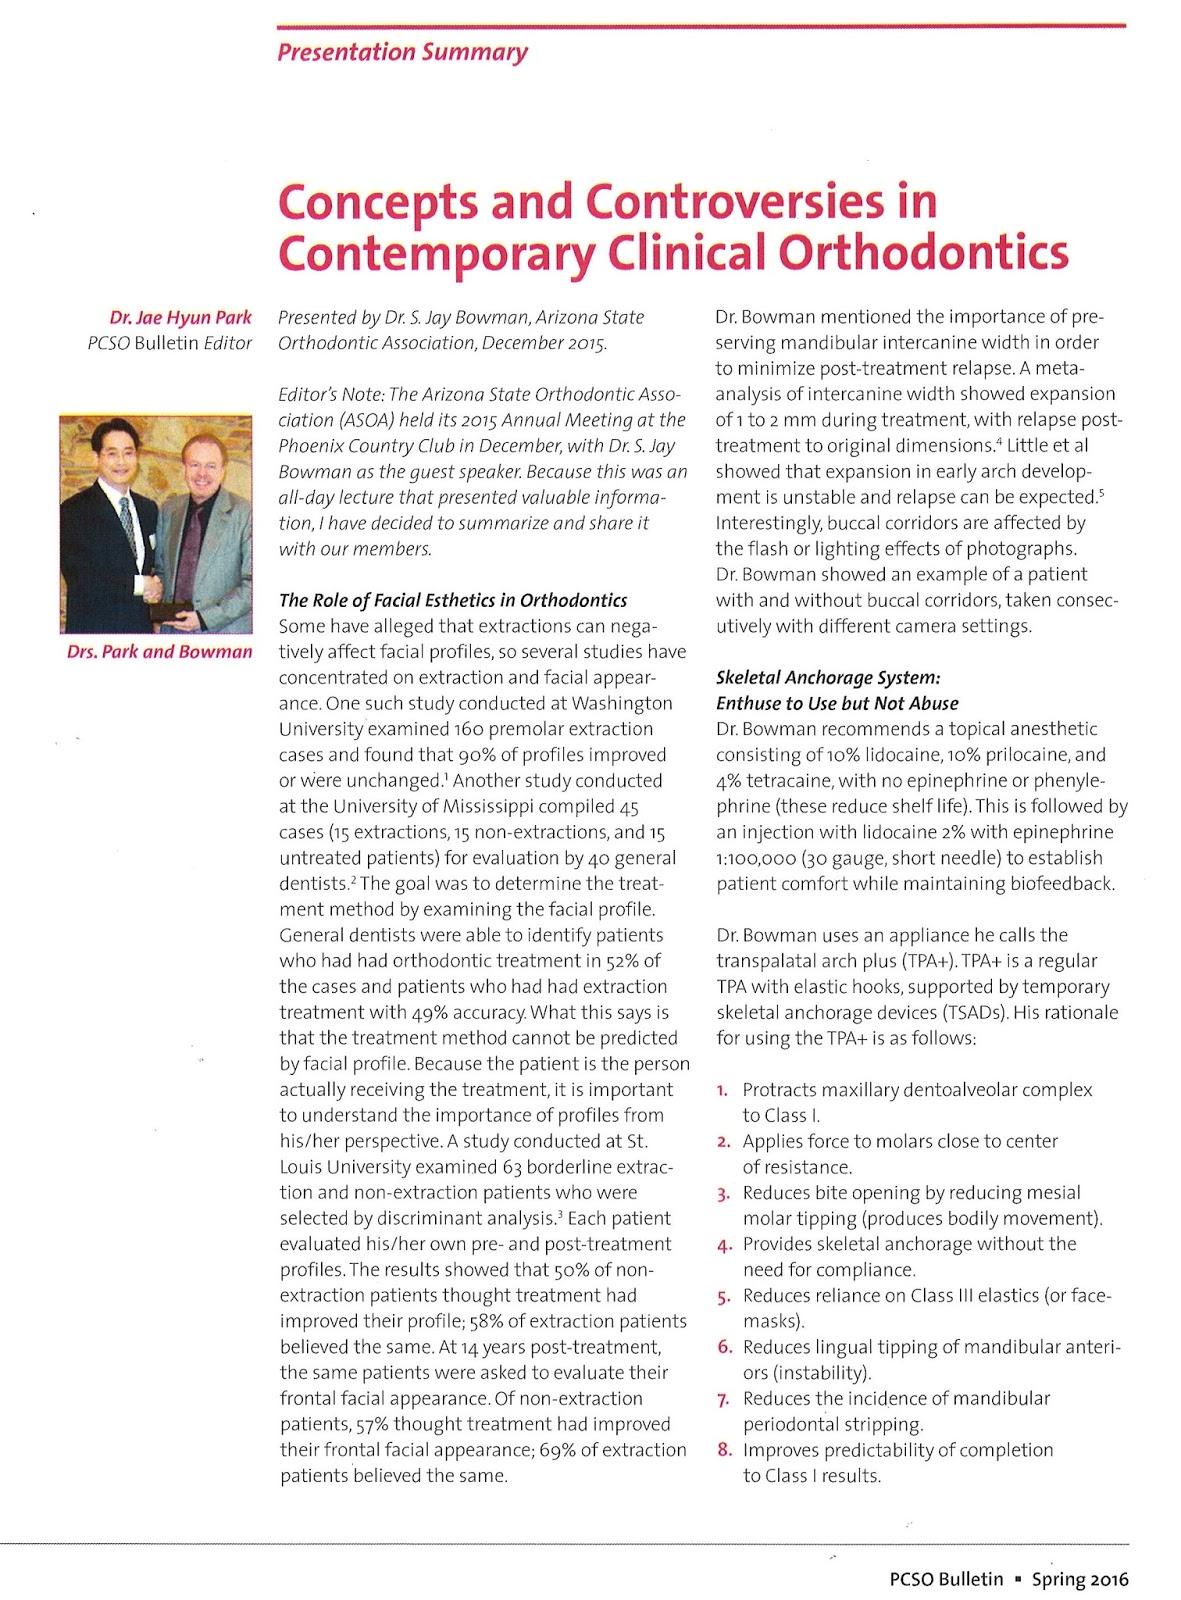 Embracing Innovative Orthodontics - Portage, Kalamazoo, Paw Paw, MI